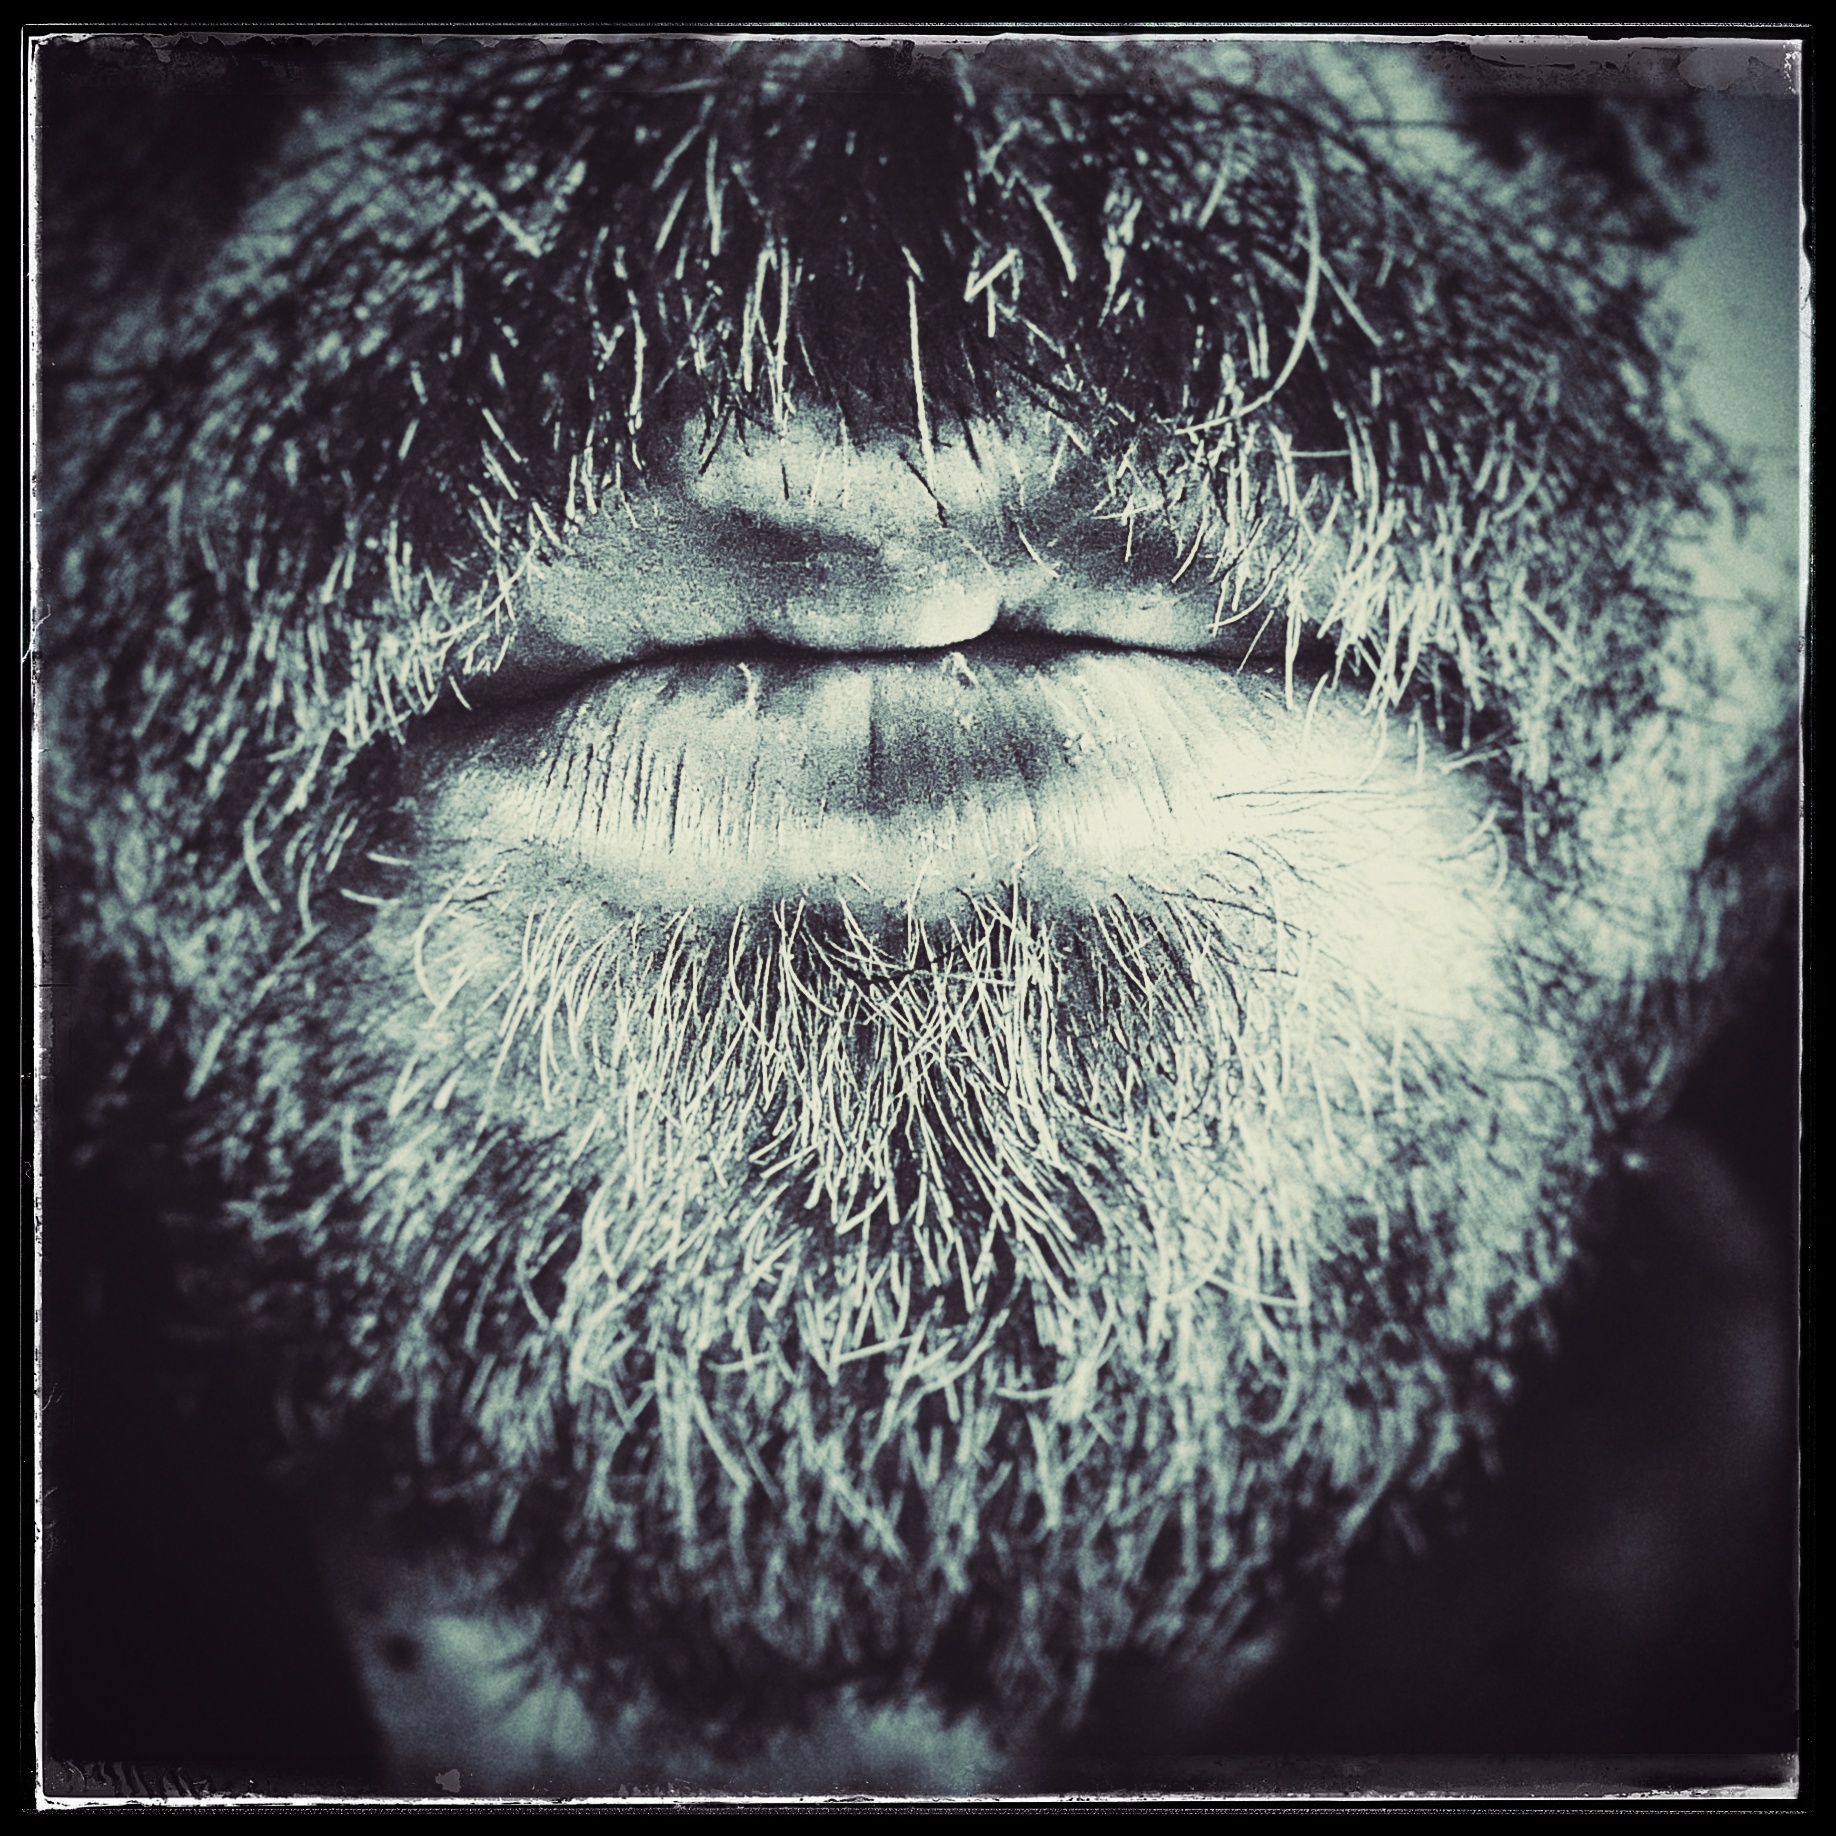 Day 44 - February 13: Beard